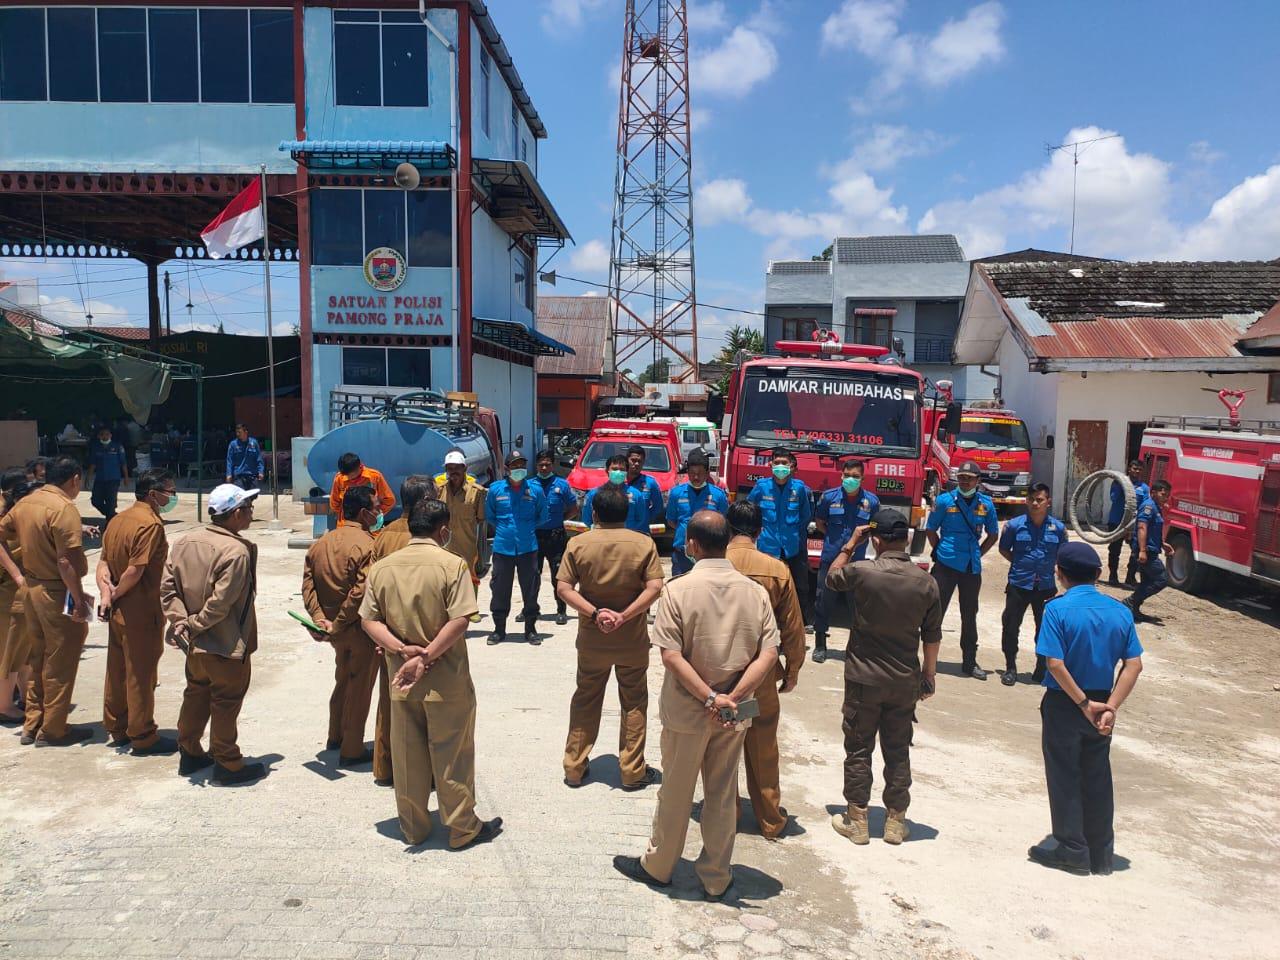 Persiapan Pemberangkatan Pasukan Damkar BPBD, dan Dinas Lingkungan Hidup Melakukan Penyemprotan Disinfektan di Beberapa Kecamatan di Humbang Hasundutan